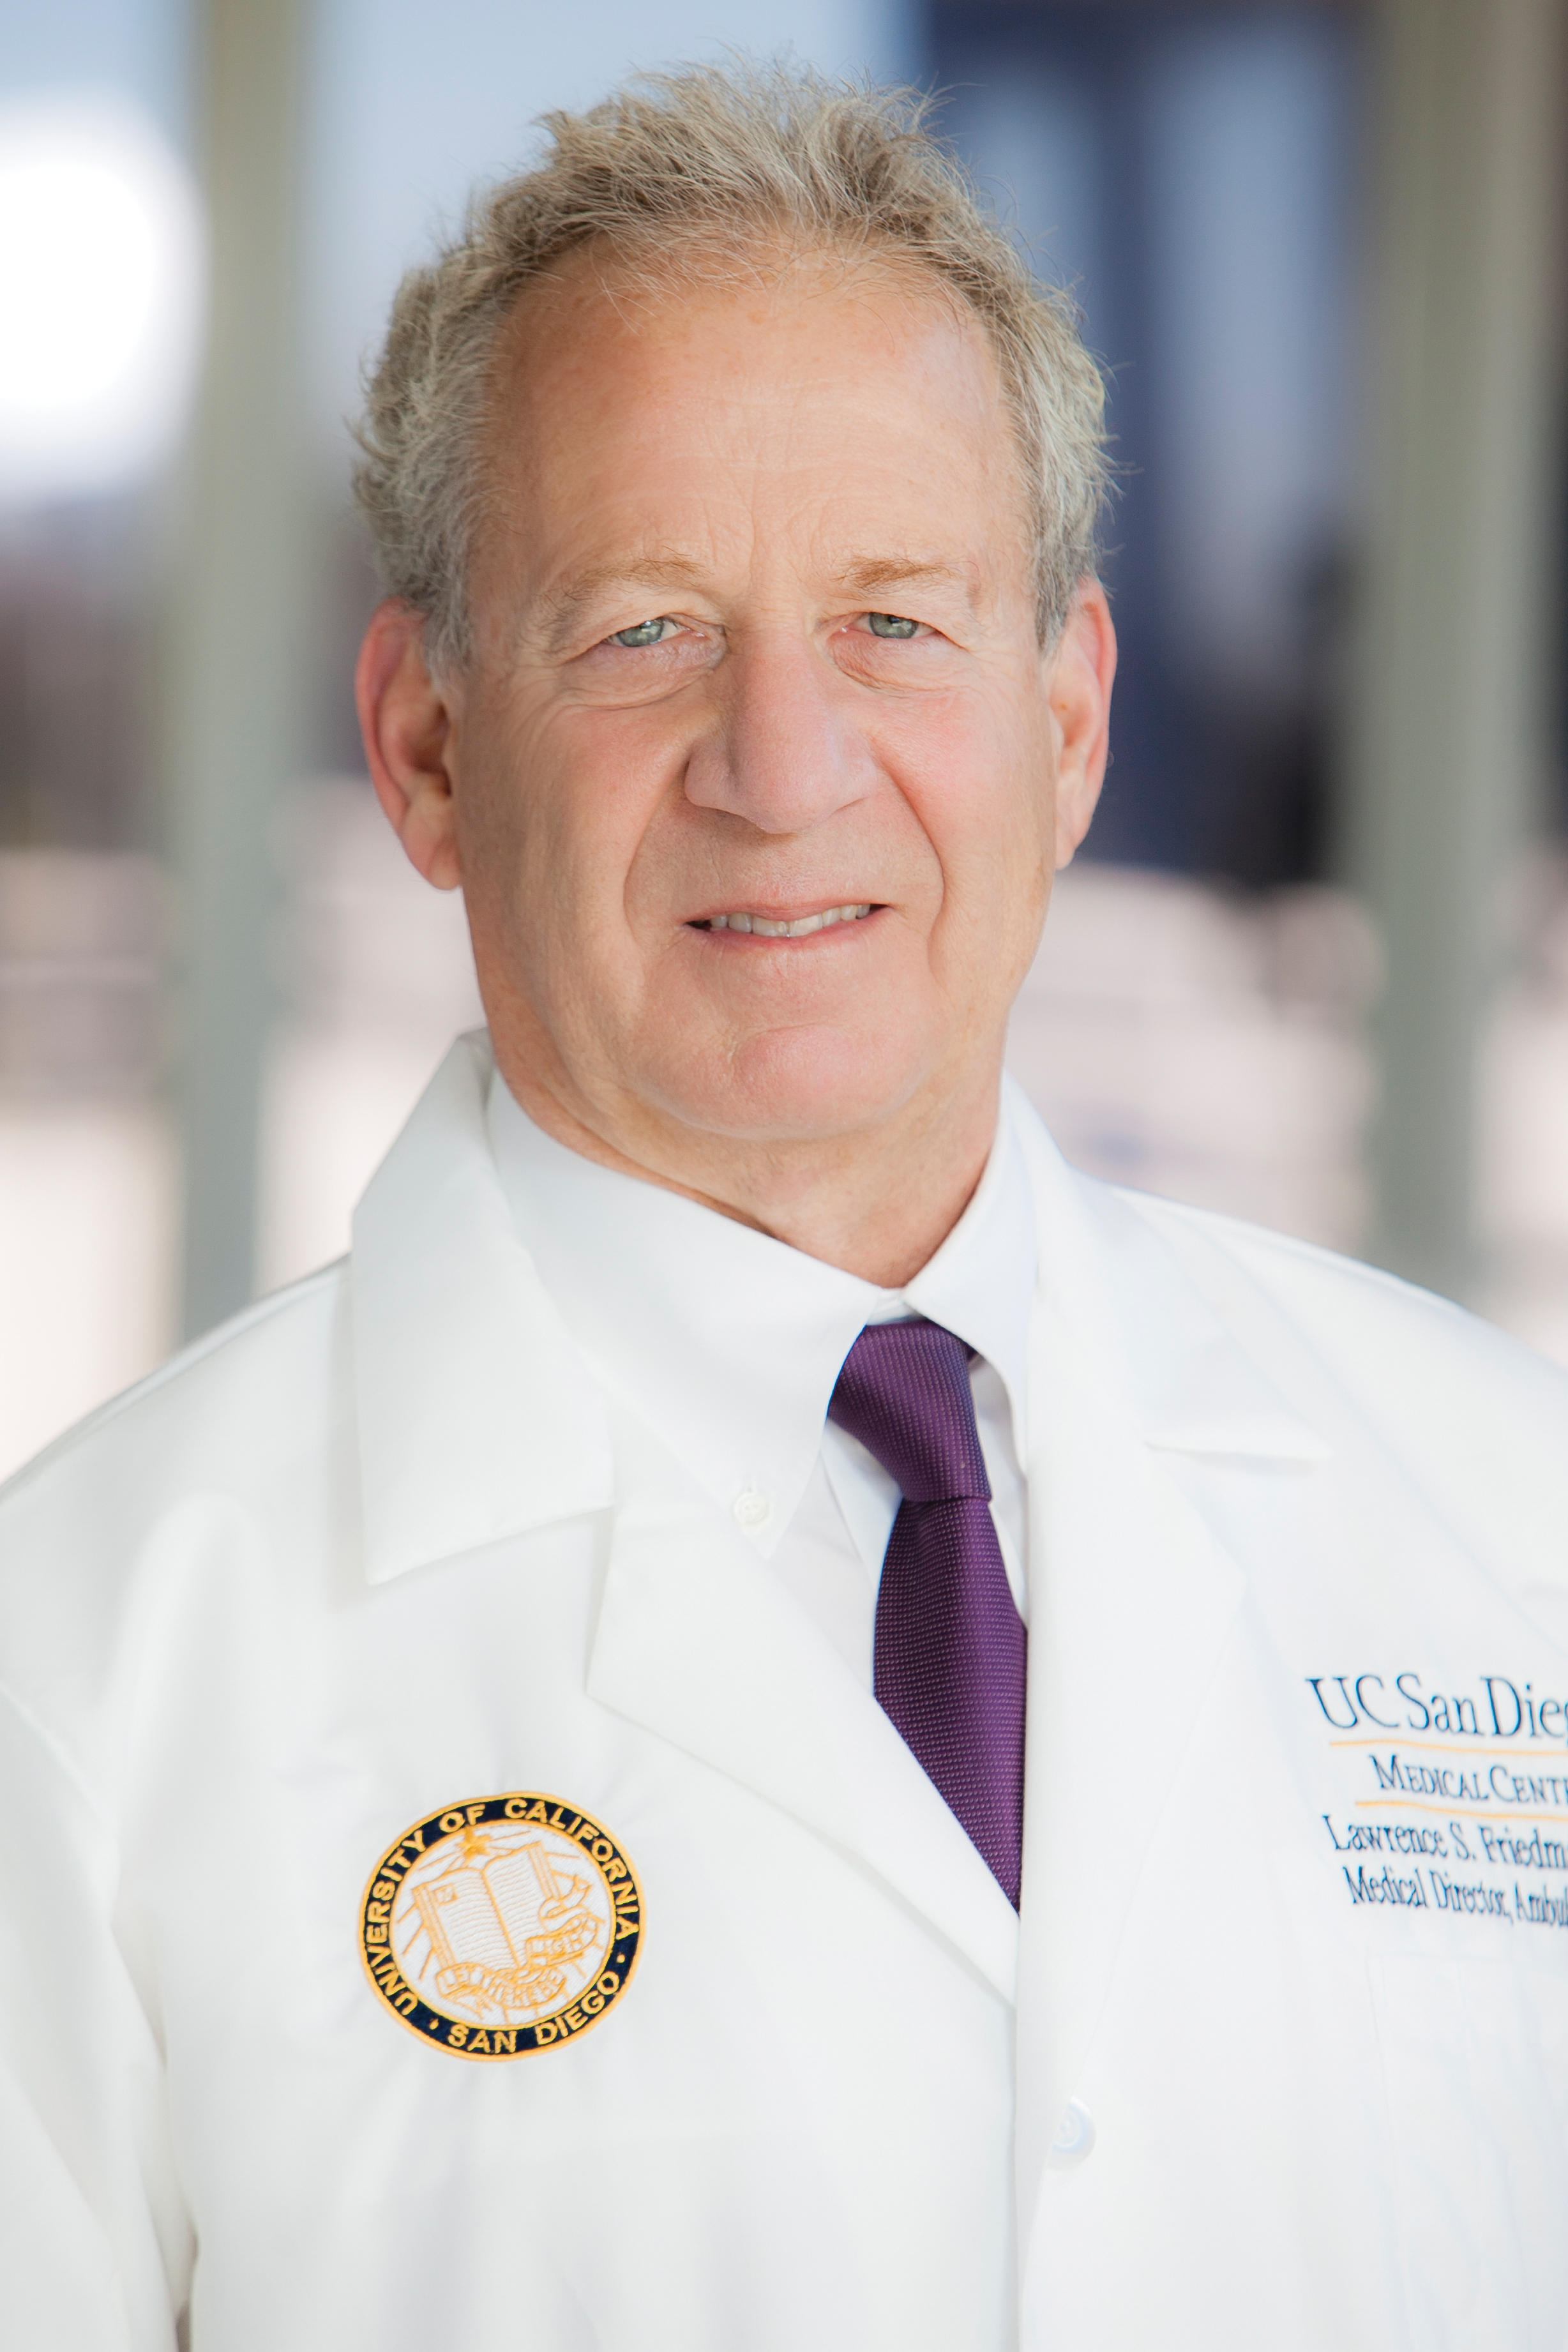 Lawrence Friedman, MD